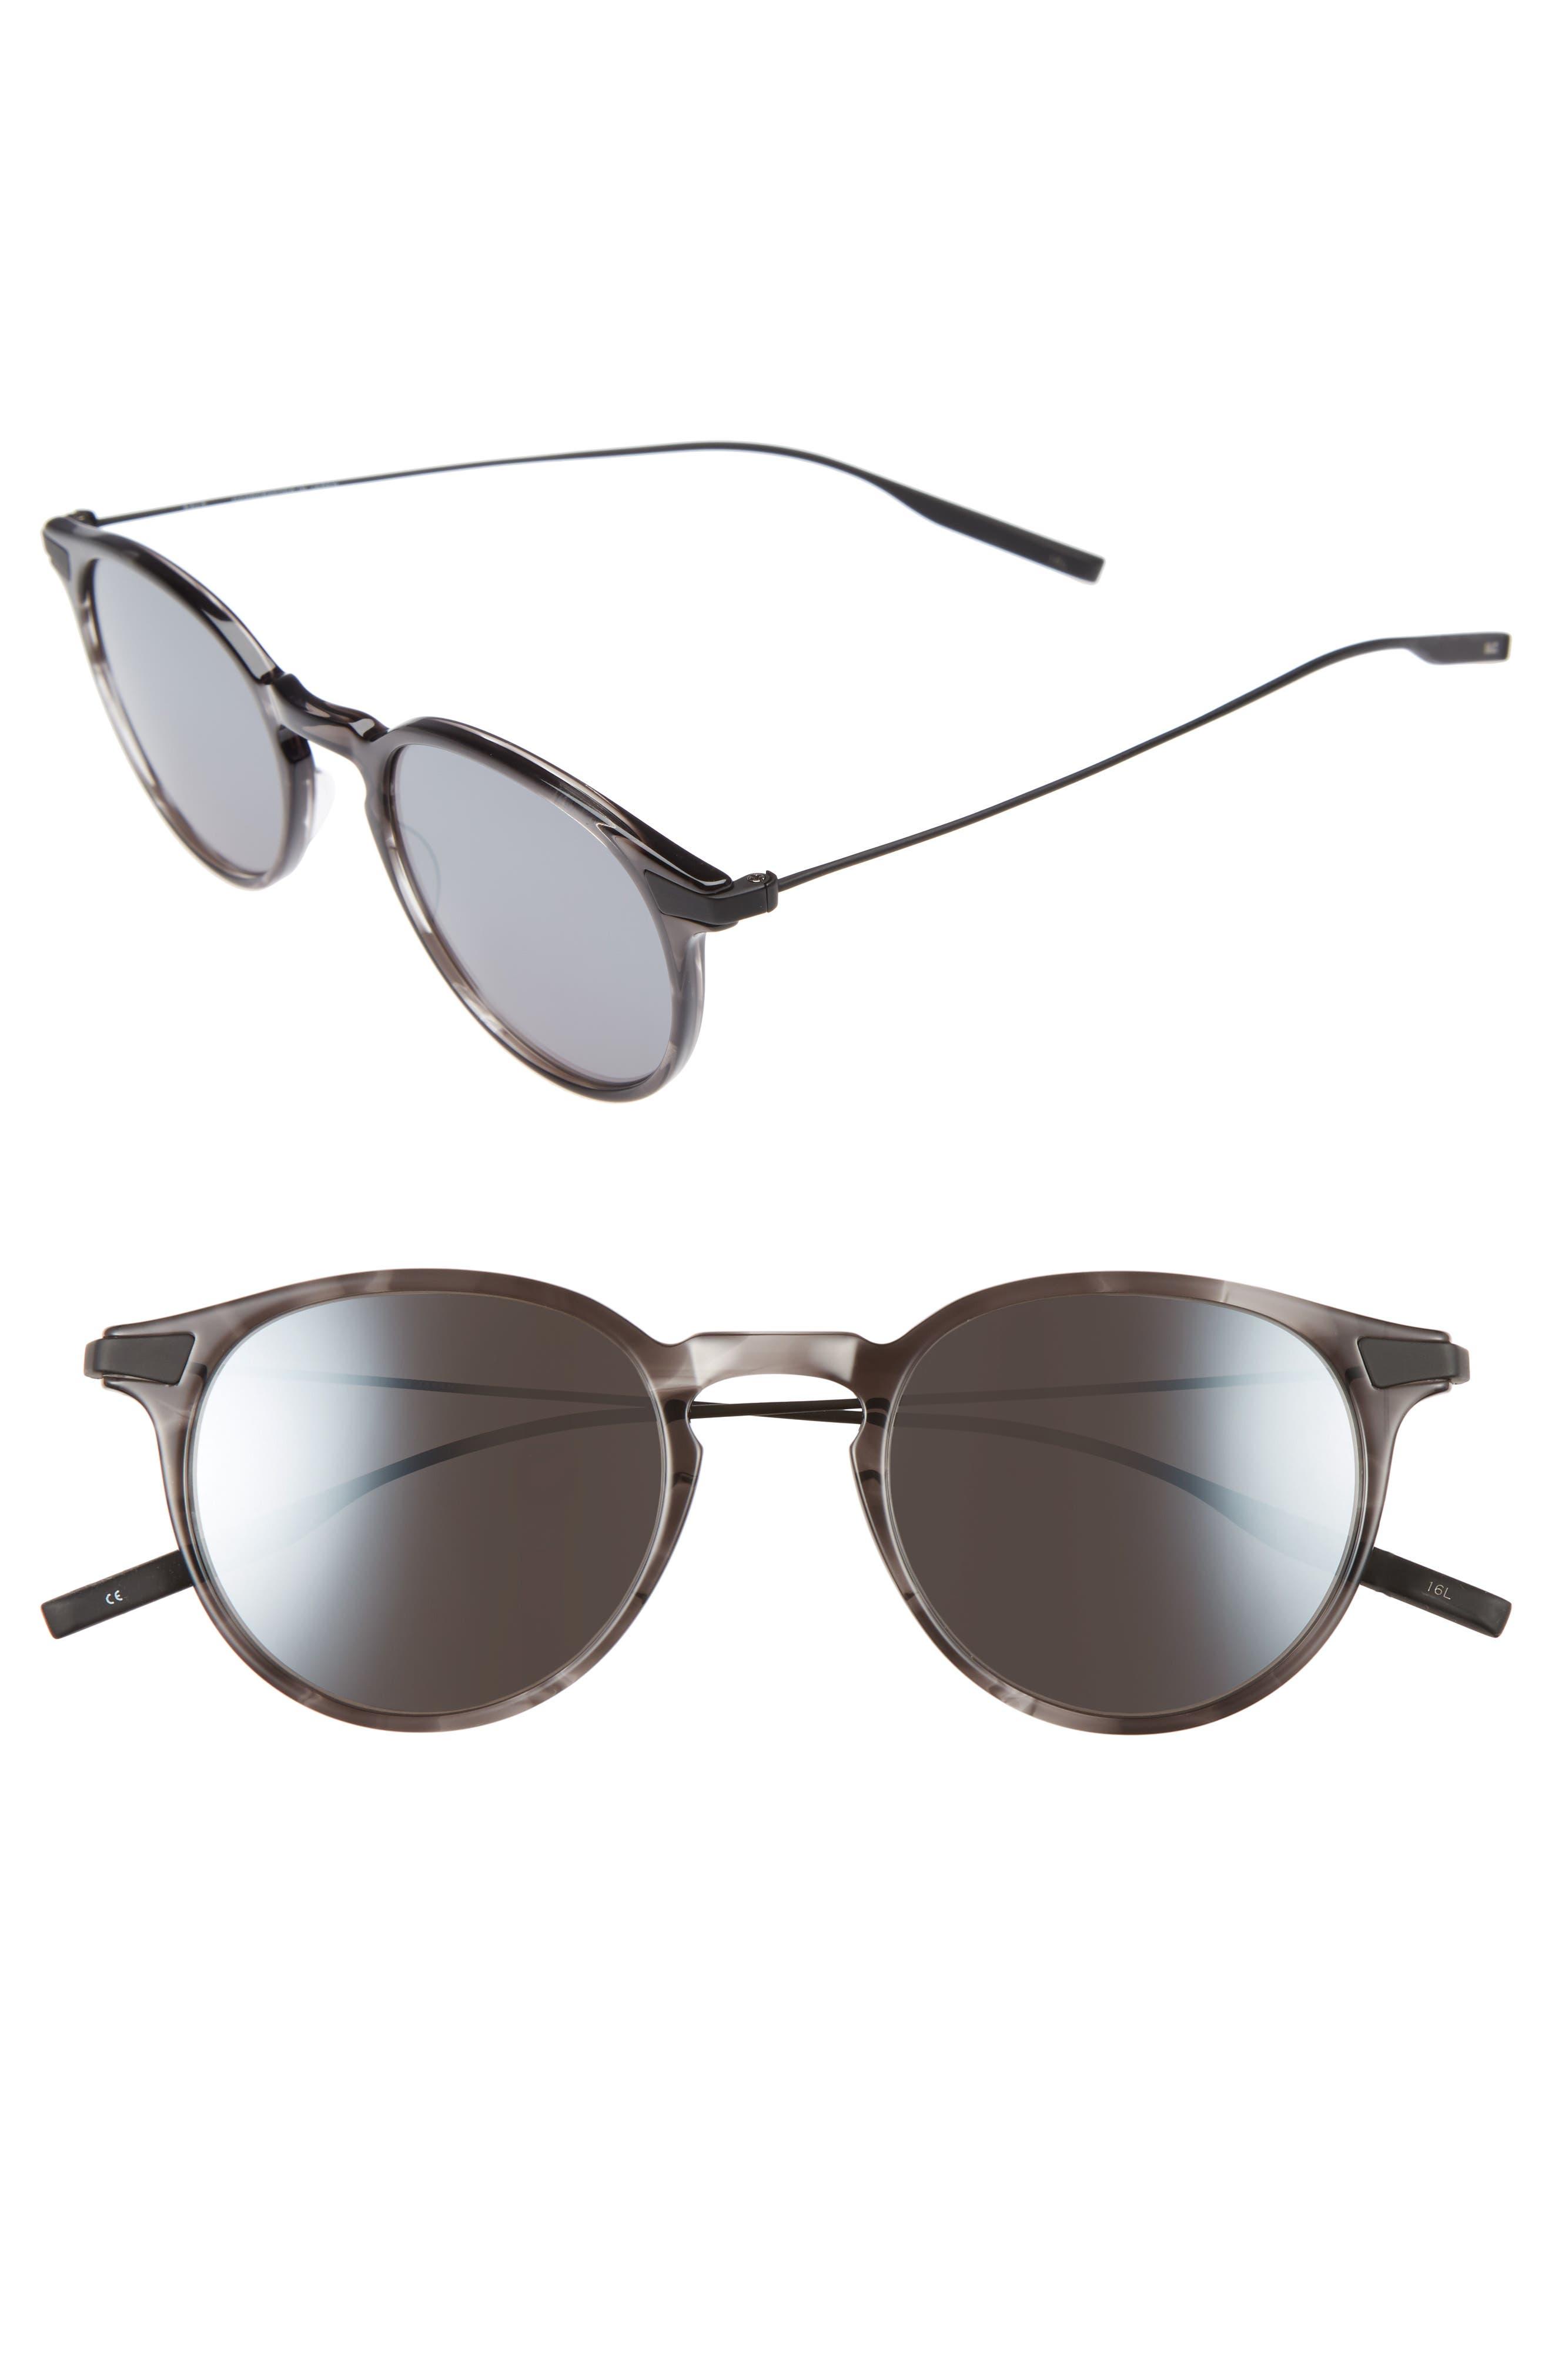 Rick 48mm Polarized Round Sunglasses,                         Main,                         color, 020